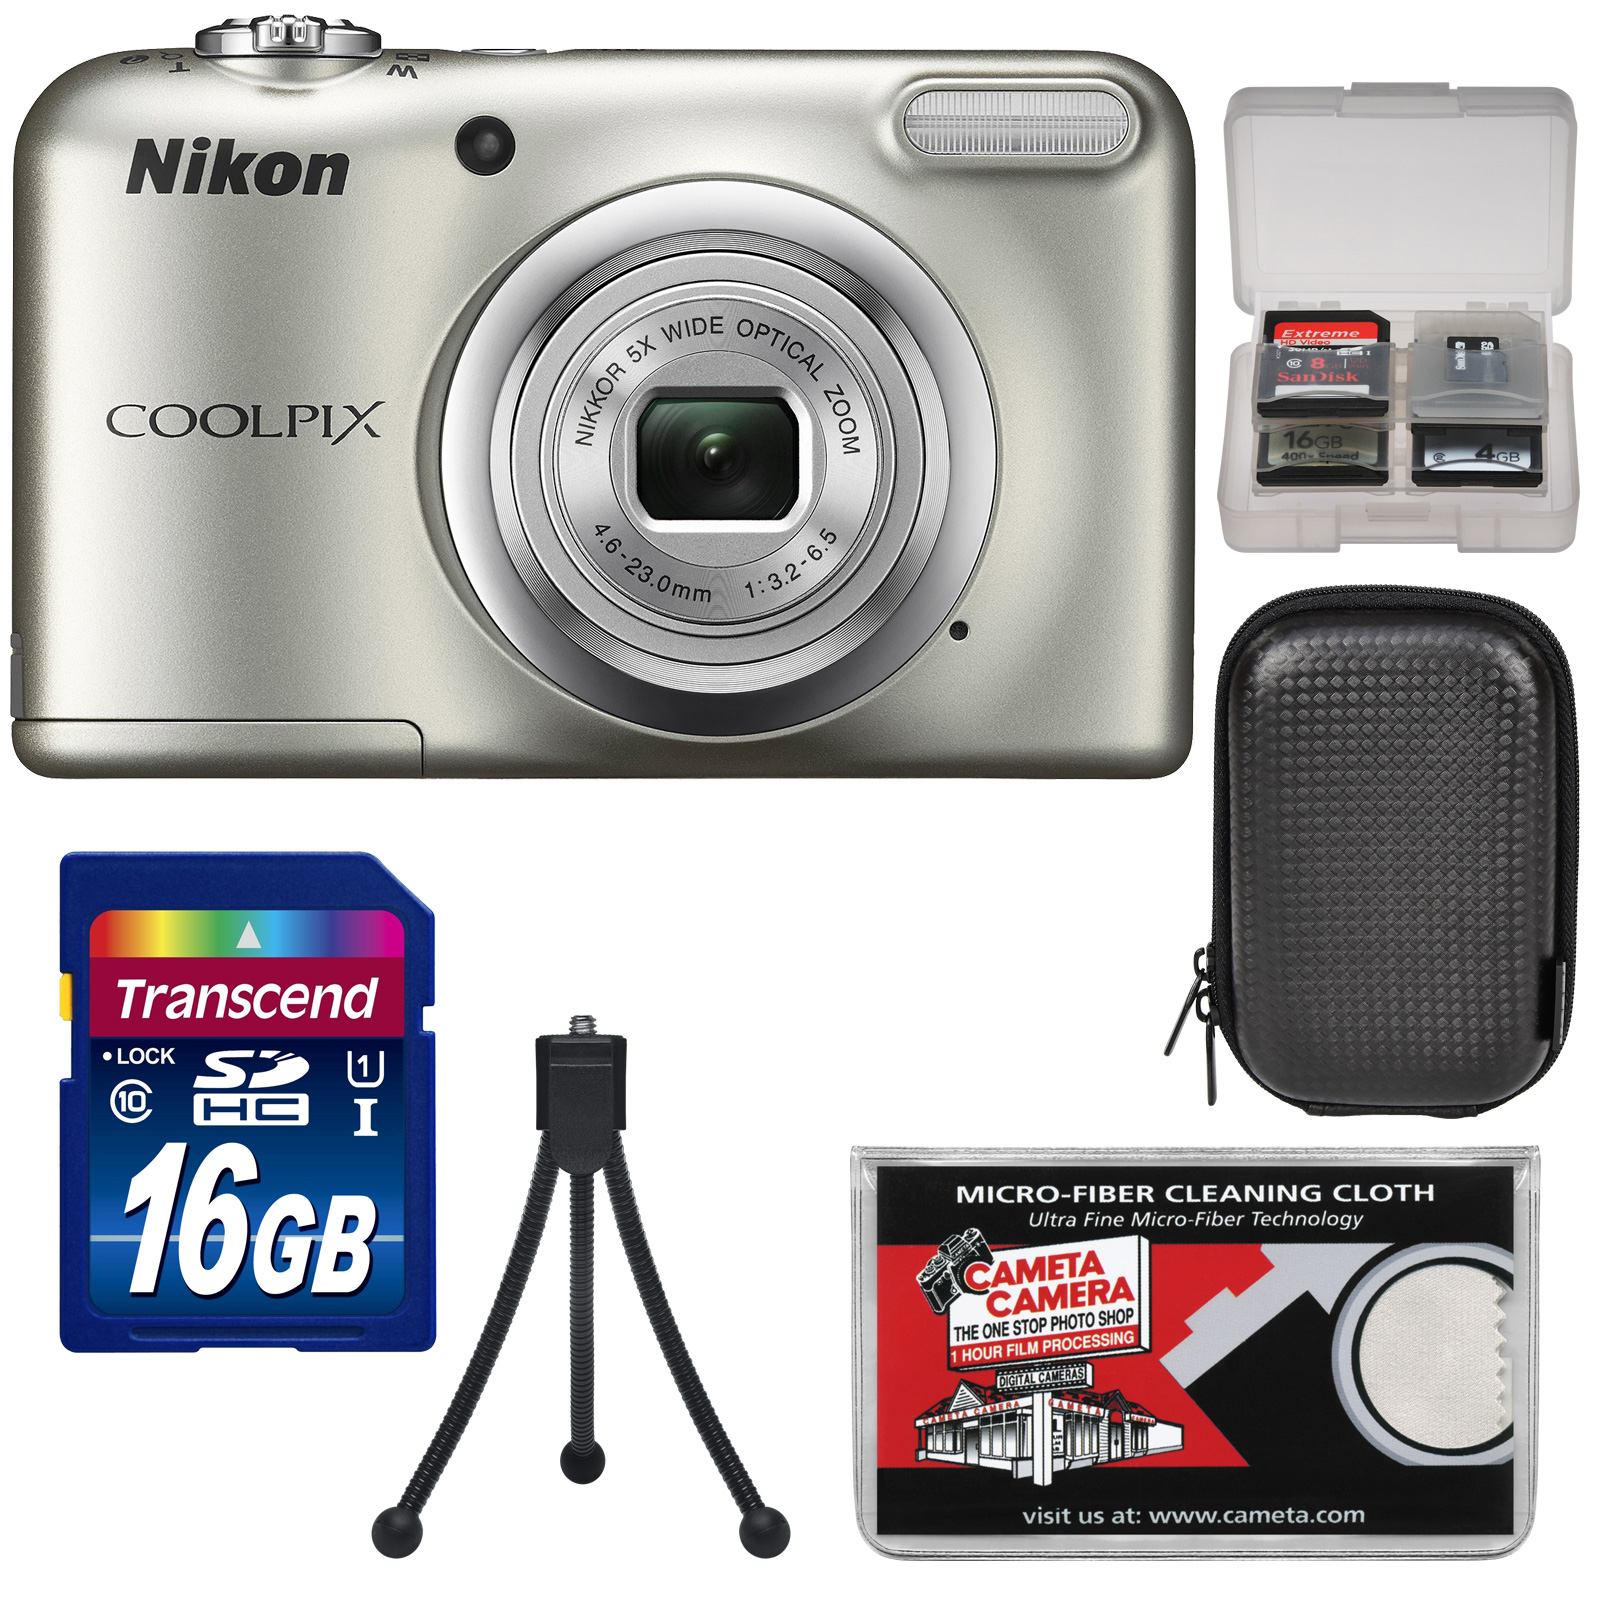 Nikon Coolpix A10 Digital Camera (Silver) with 16GB Card + Case + Tripod + Kit